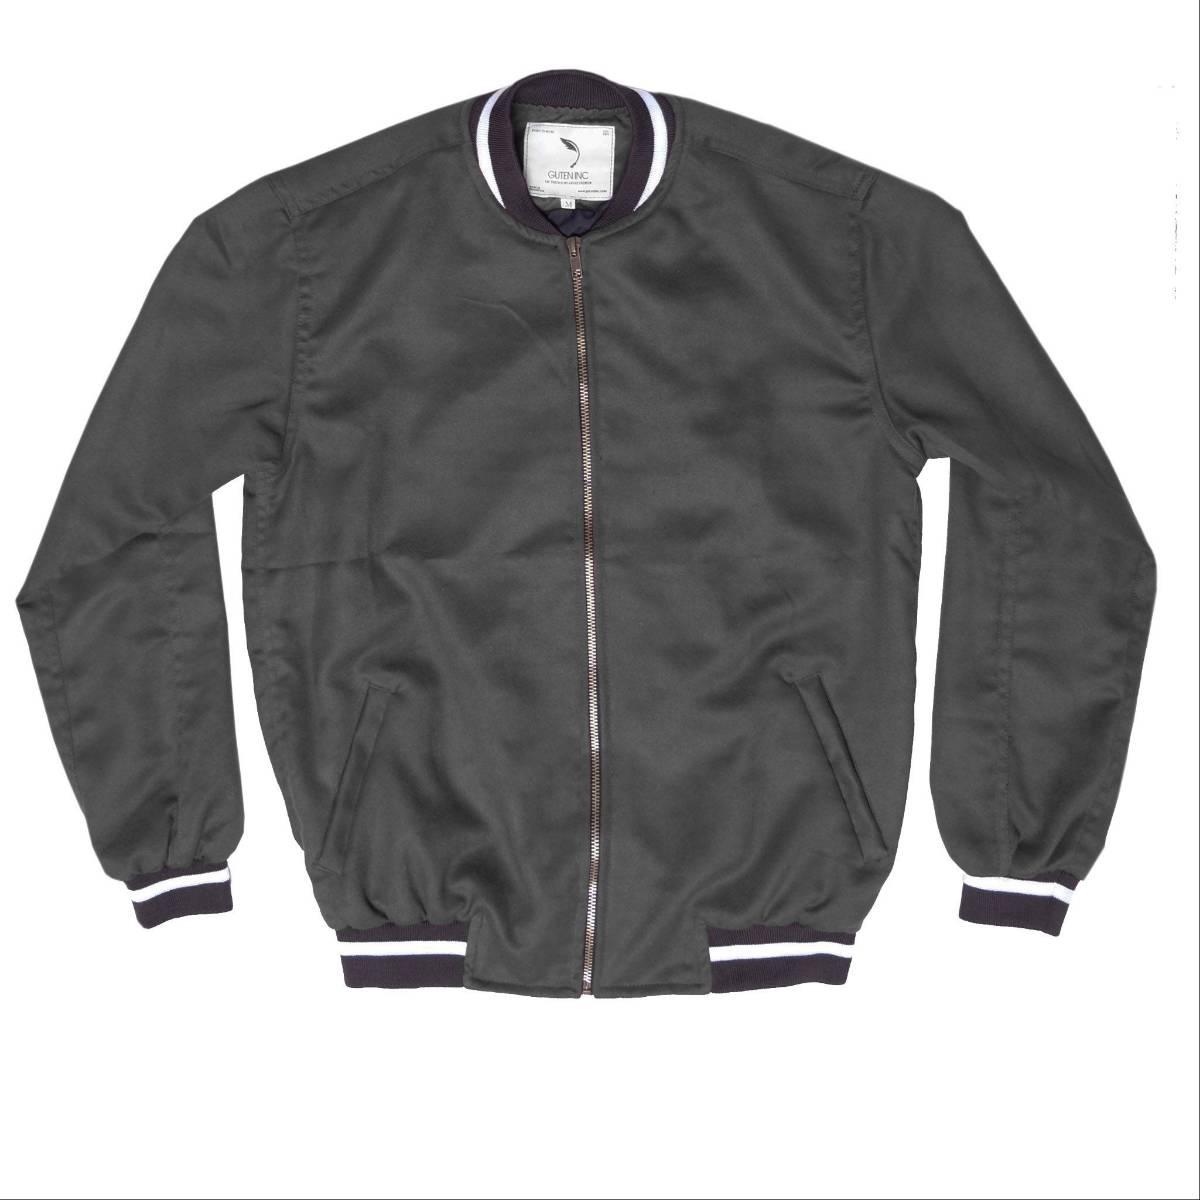 Jaket / Seth Suede Bomber Jacket Dark Grey